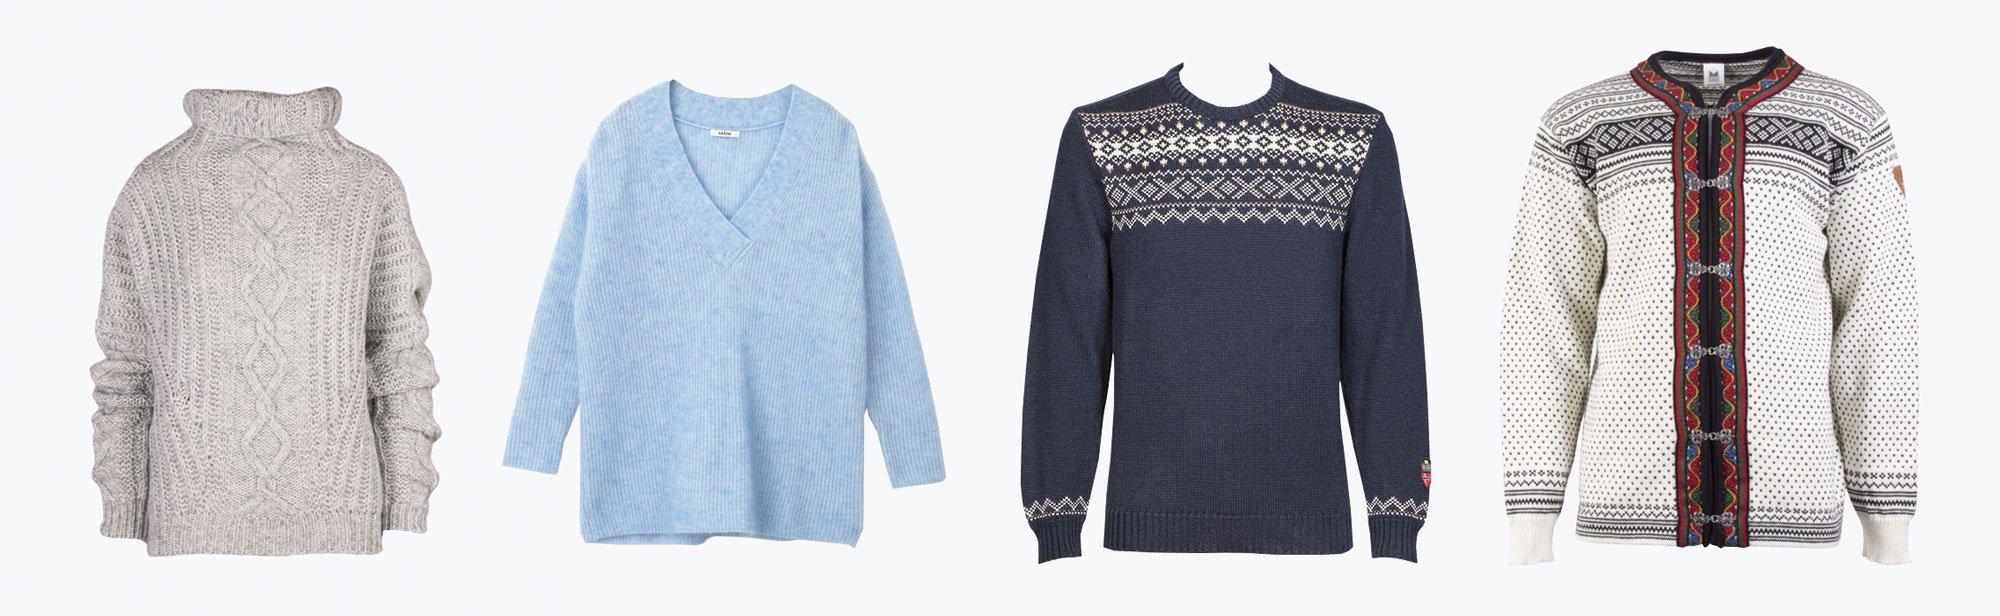 scandinavian sweaters autumn winter essentials